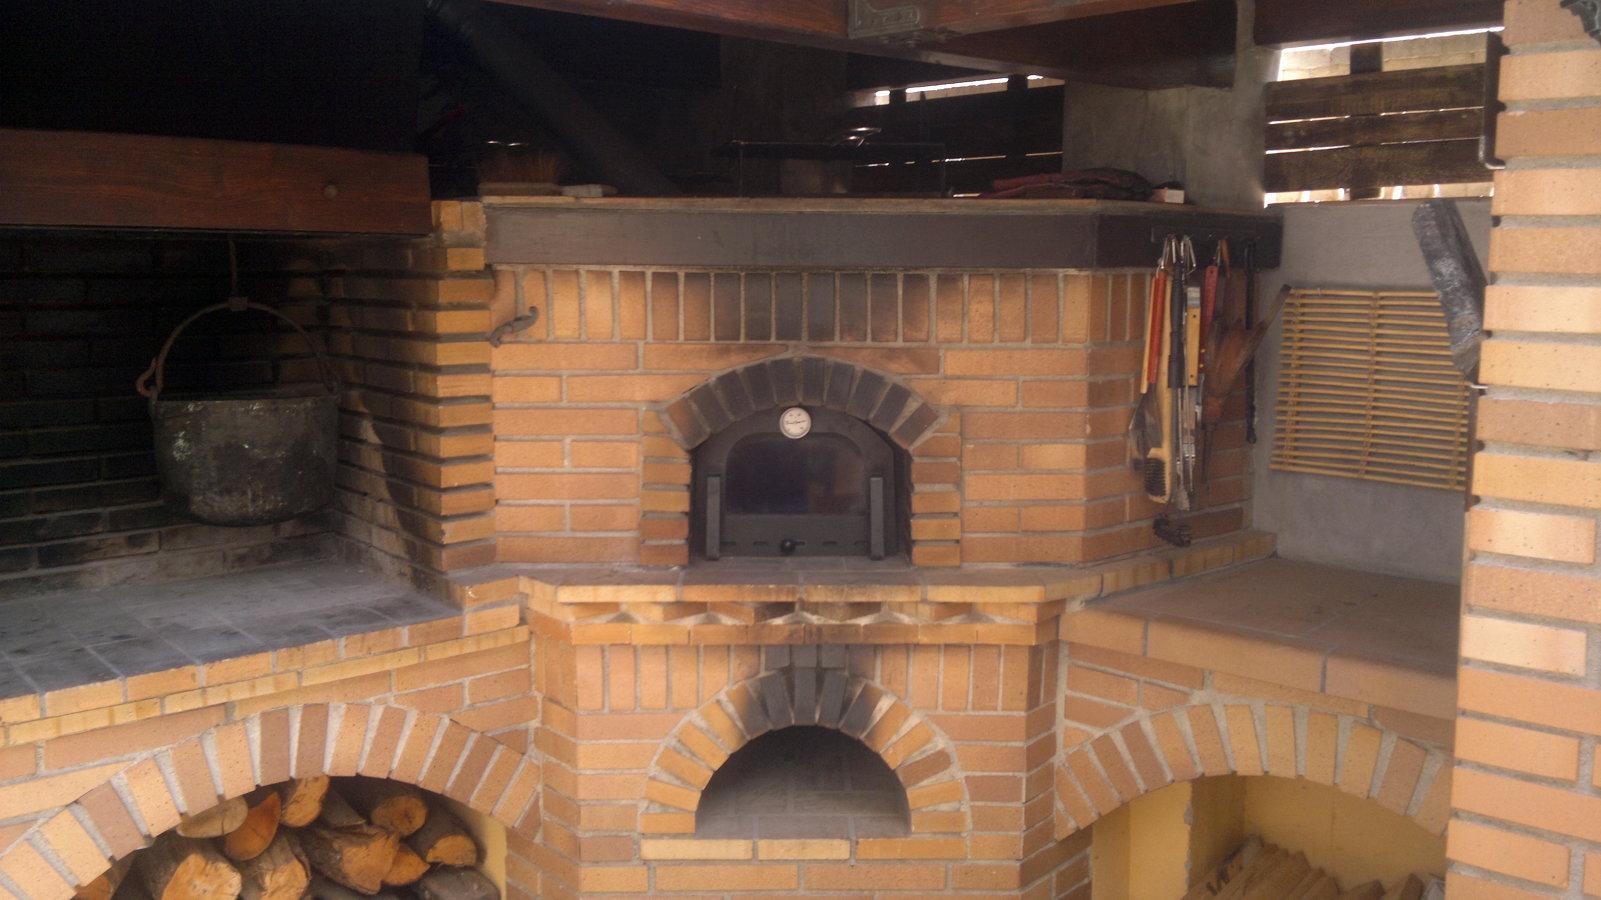 Foto horno le a argentino creixell de construccions i reformes aaron gonzalez 347187 habitissimo - Ver hornos de lena ...